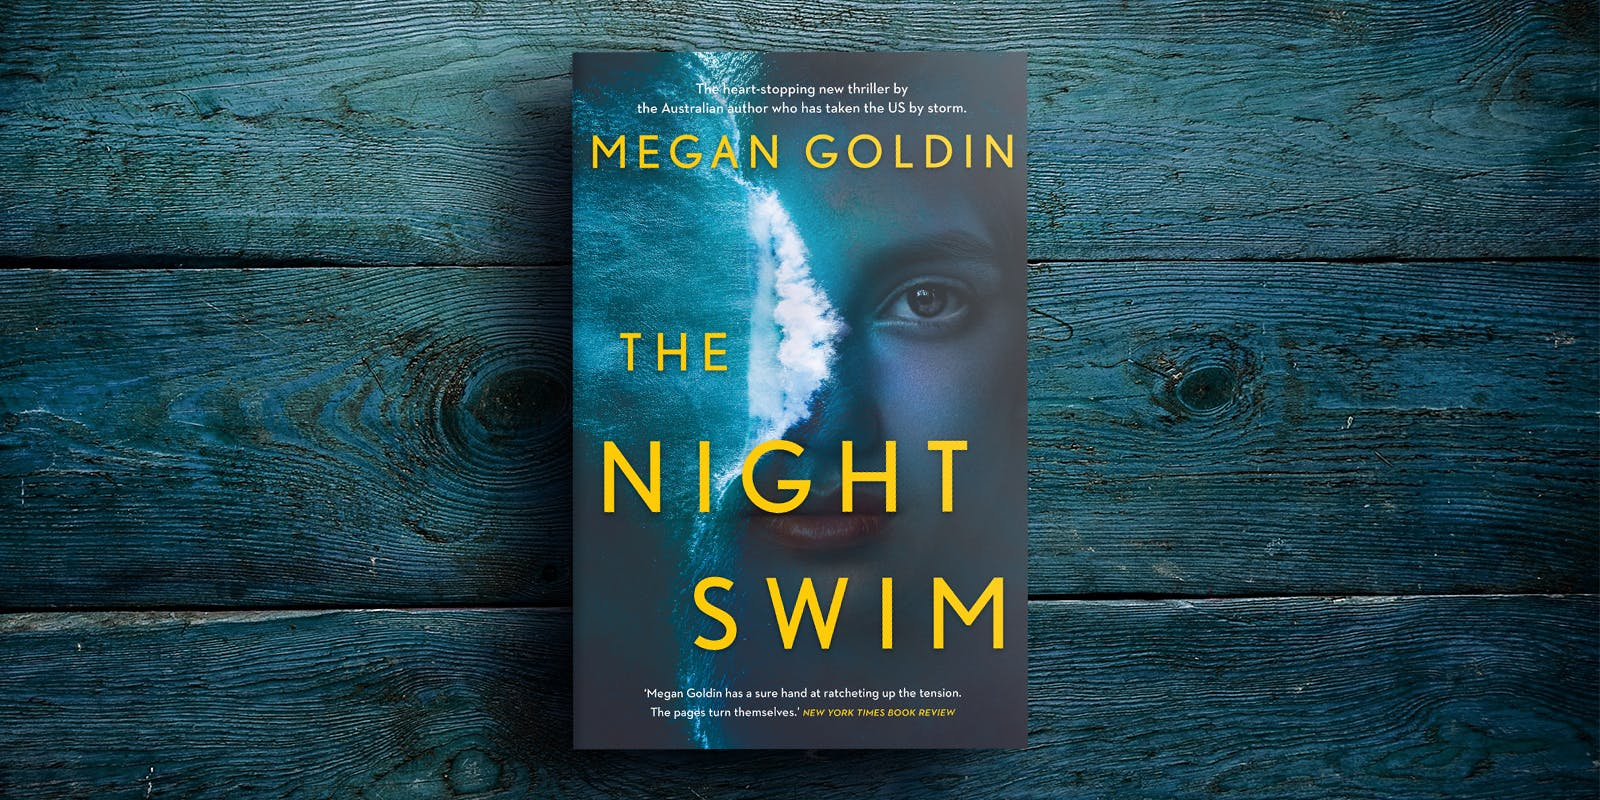 The Night Swim book club notes